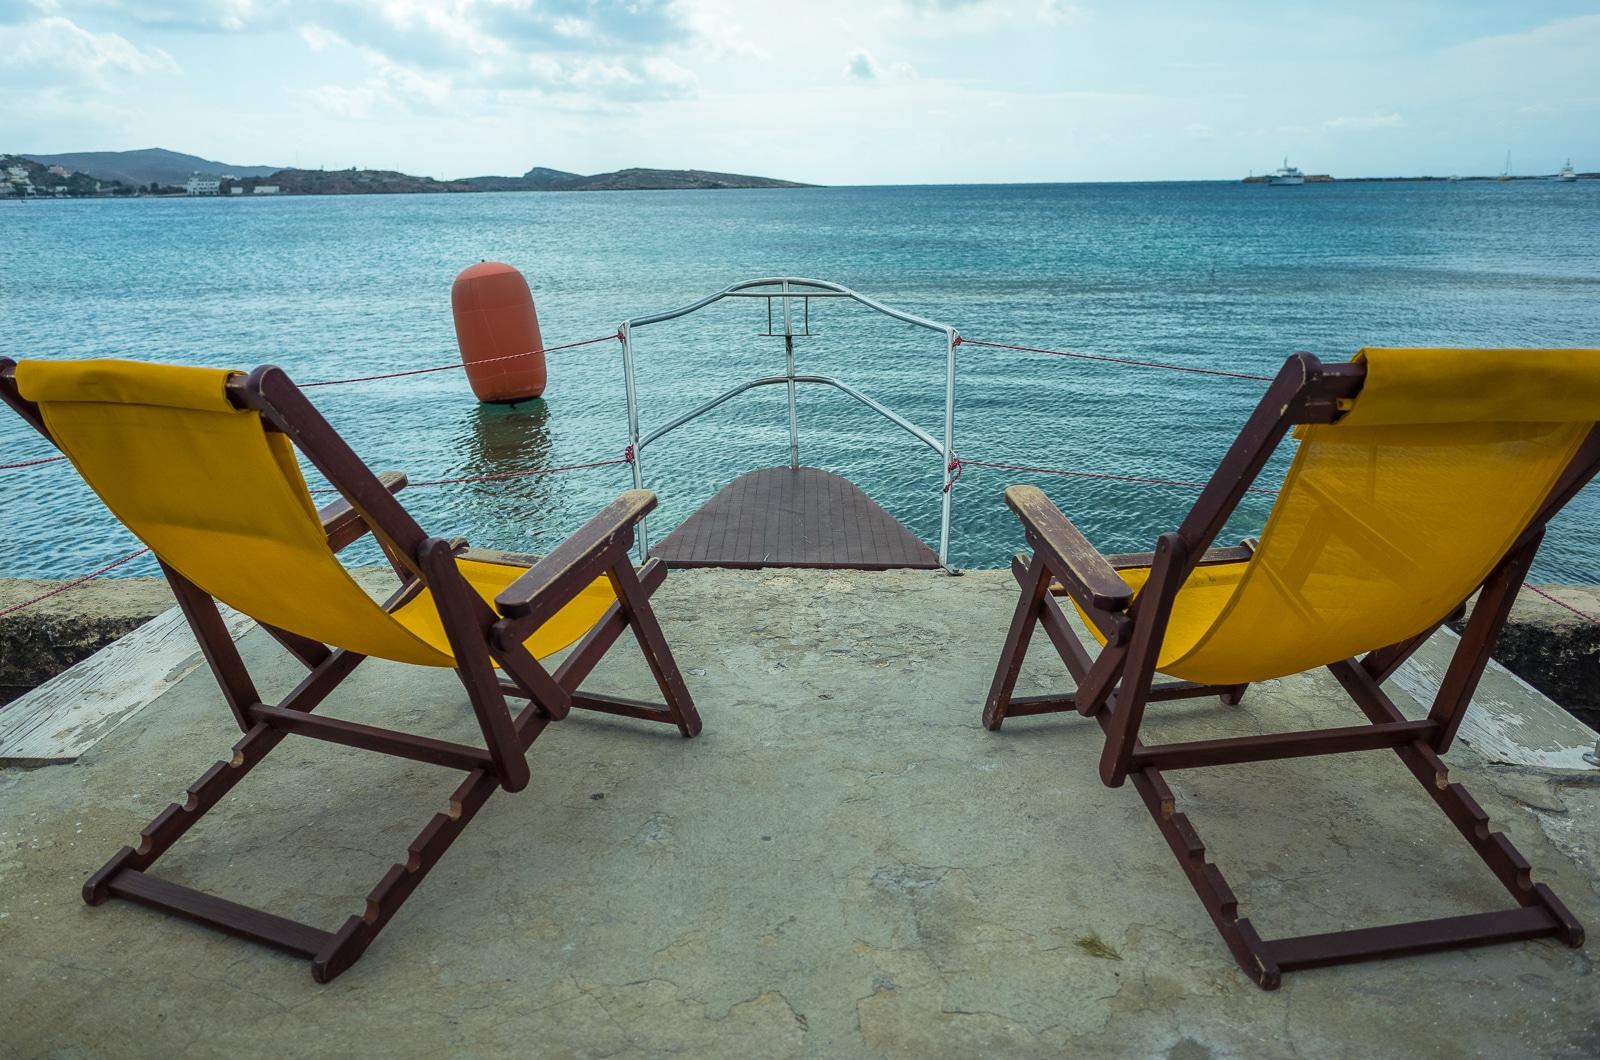 Syros : A Greek Island with Roman Influence beach life